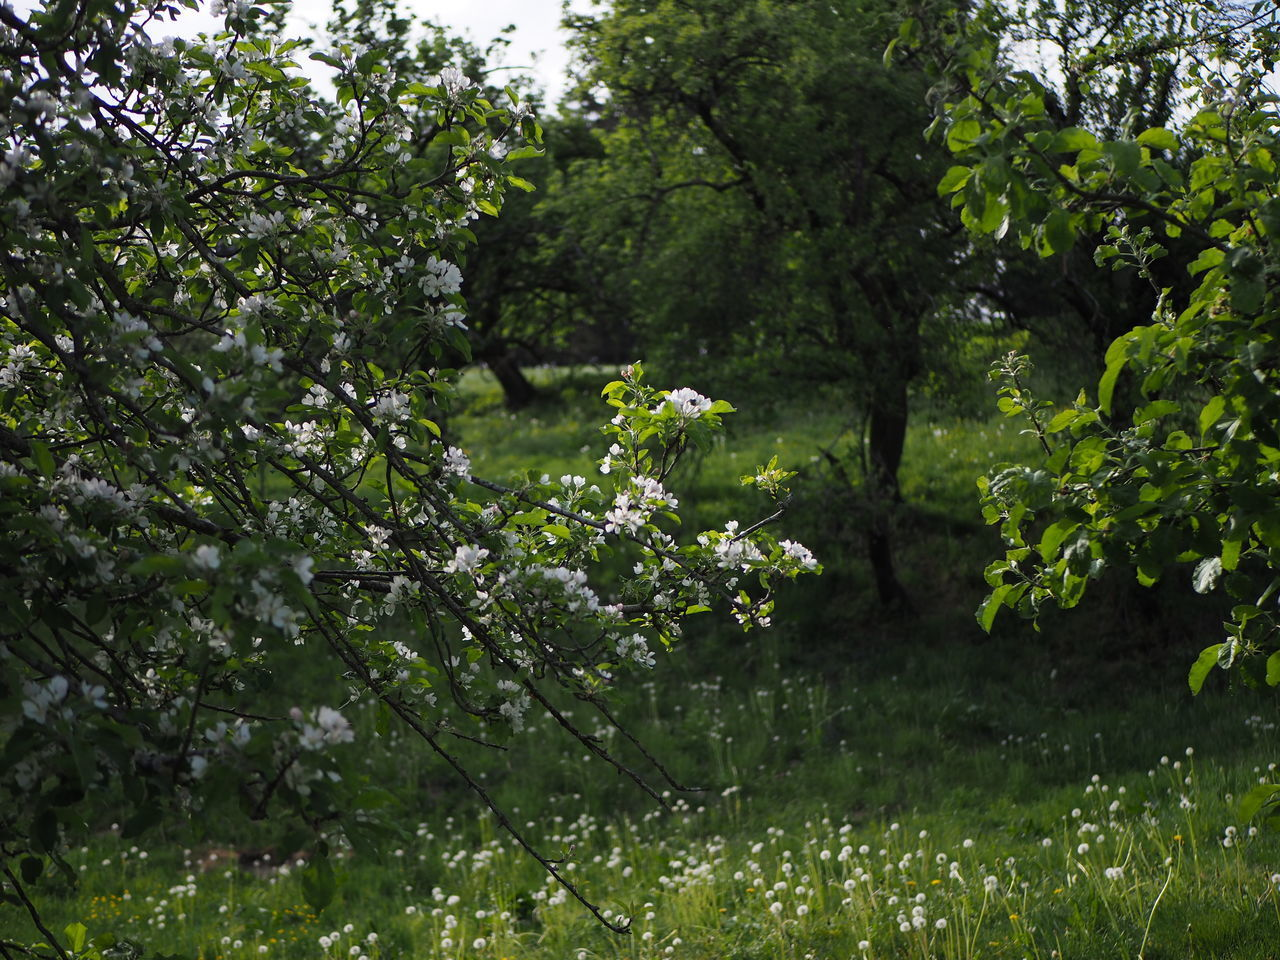 VIEW OF FLOWERING PLANTS IN SUNLIGHT